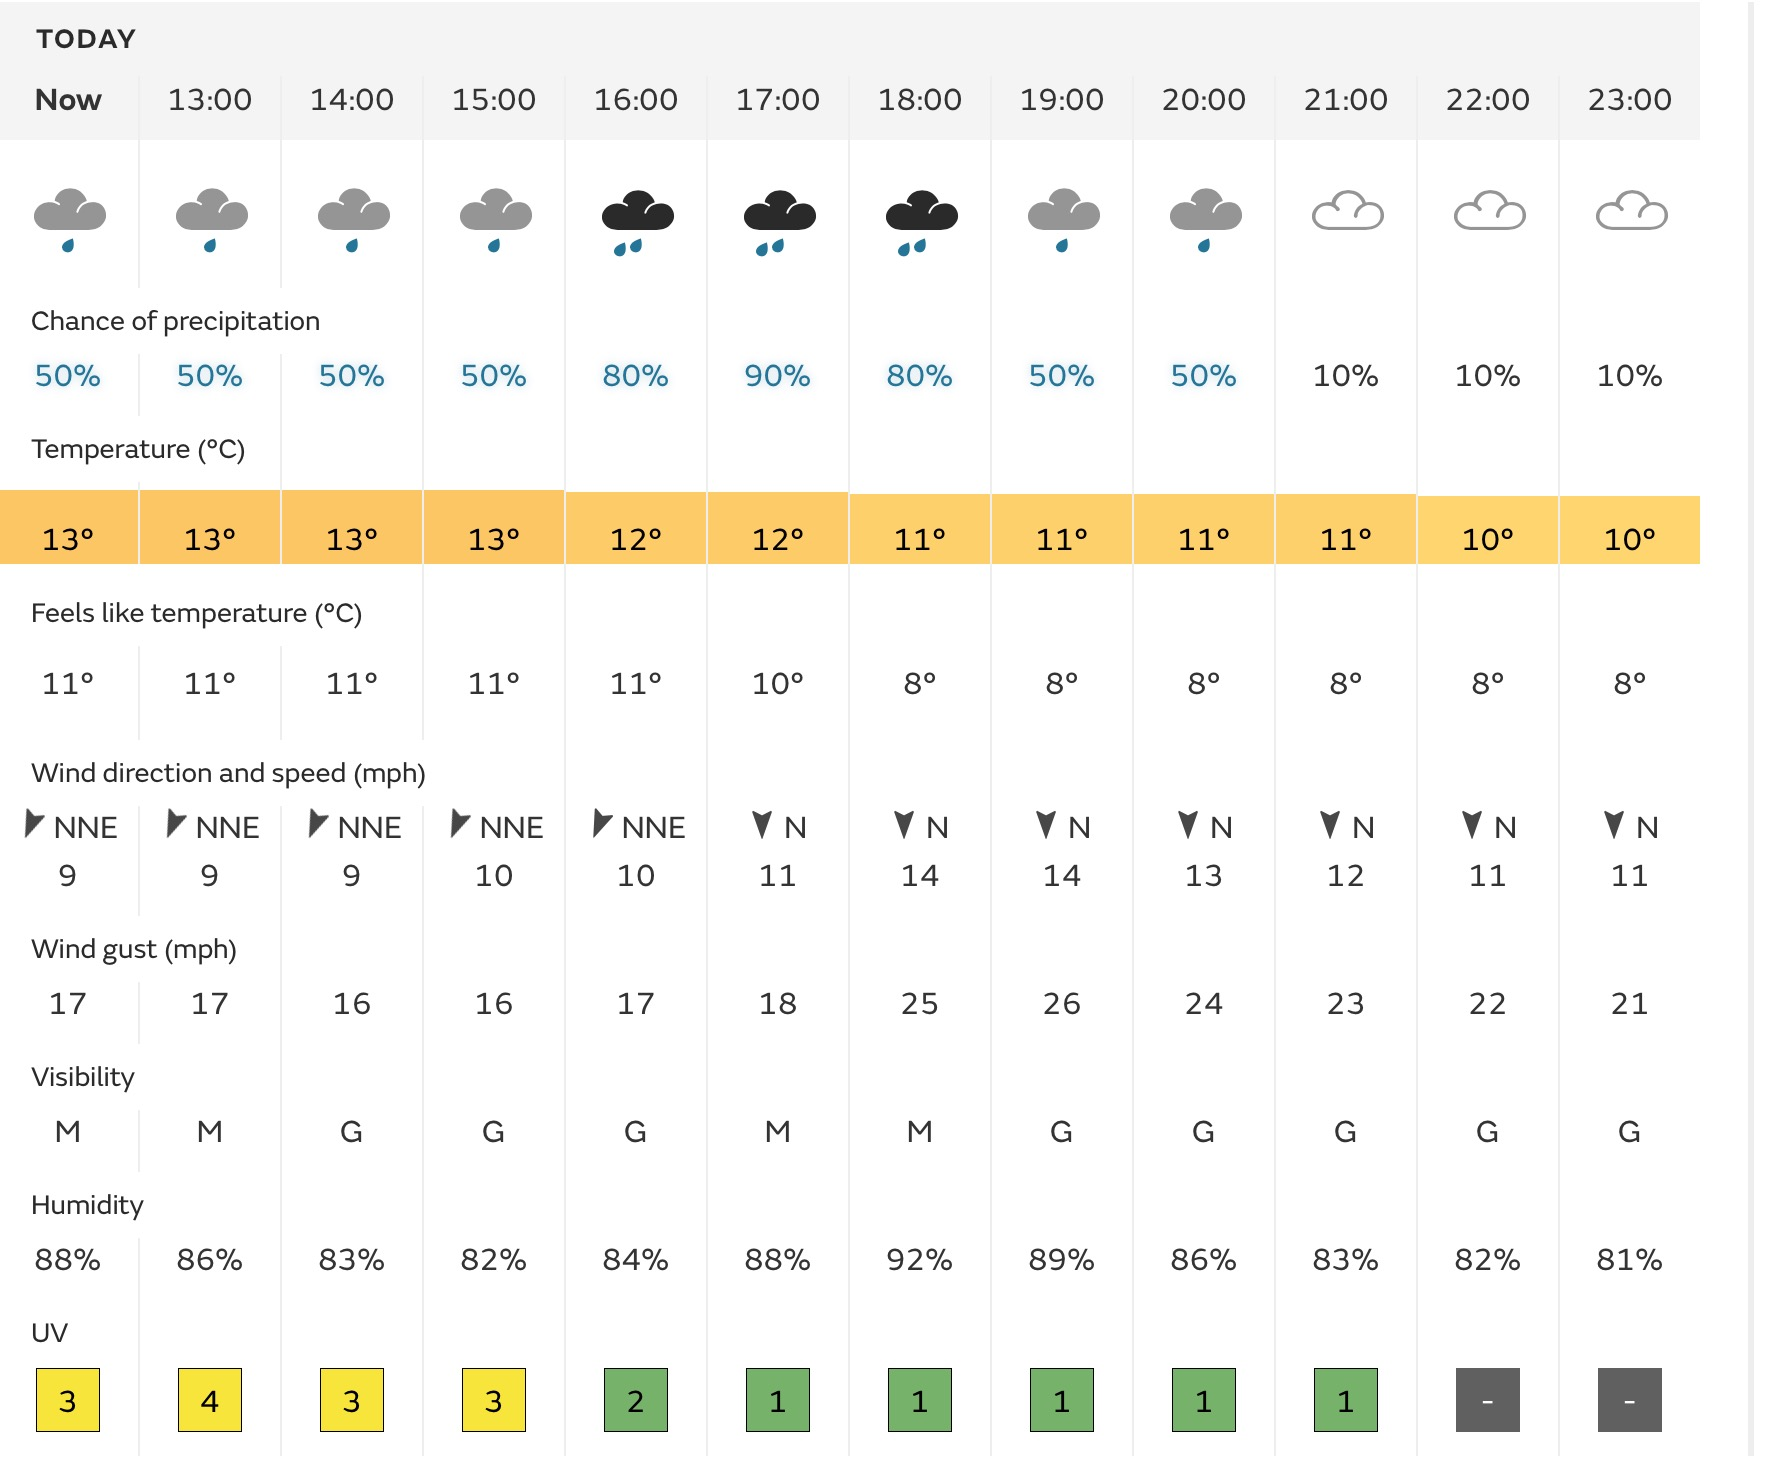 3 June: Nottingham weather